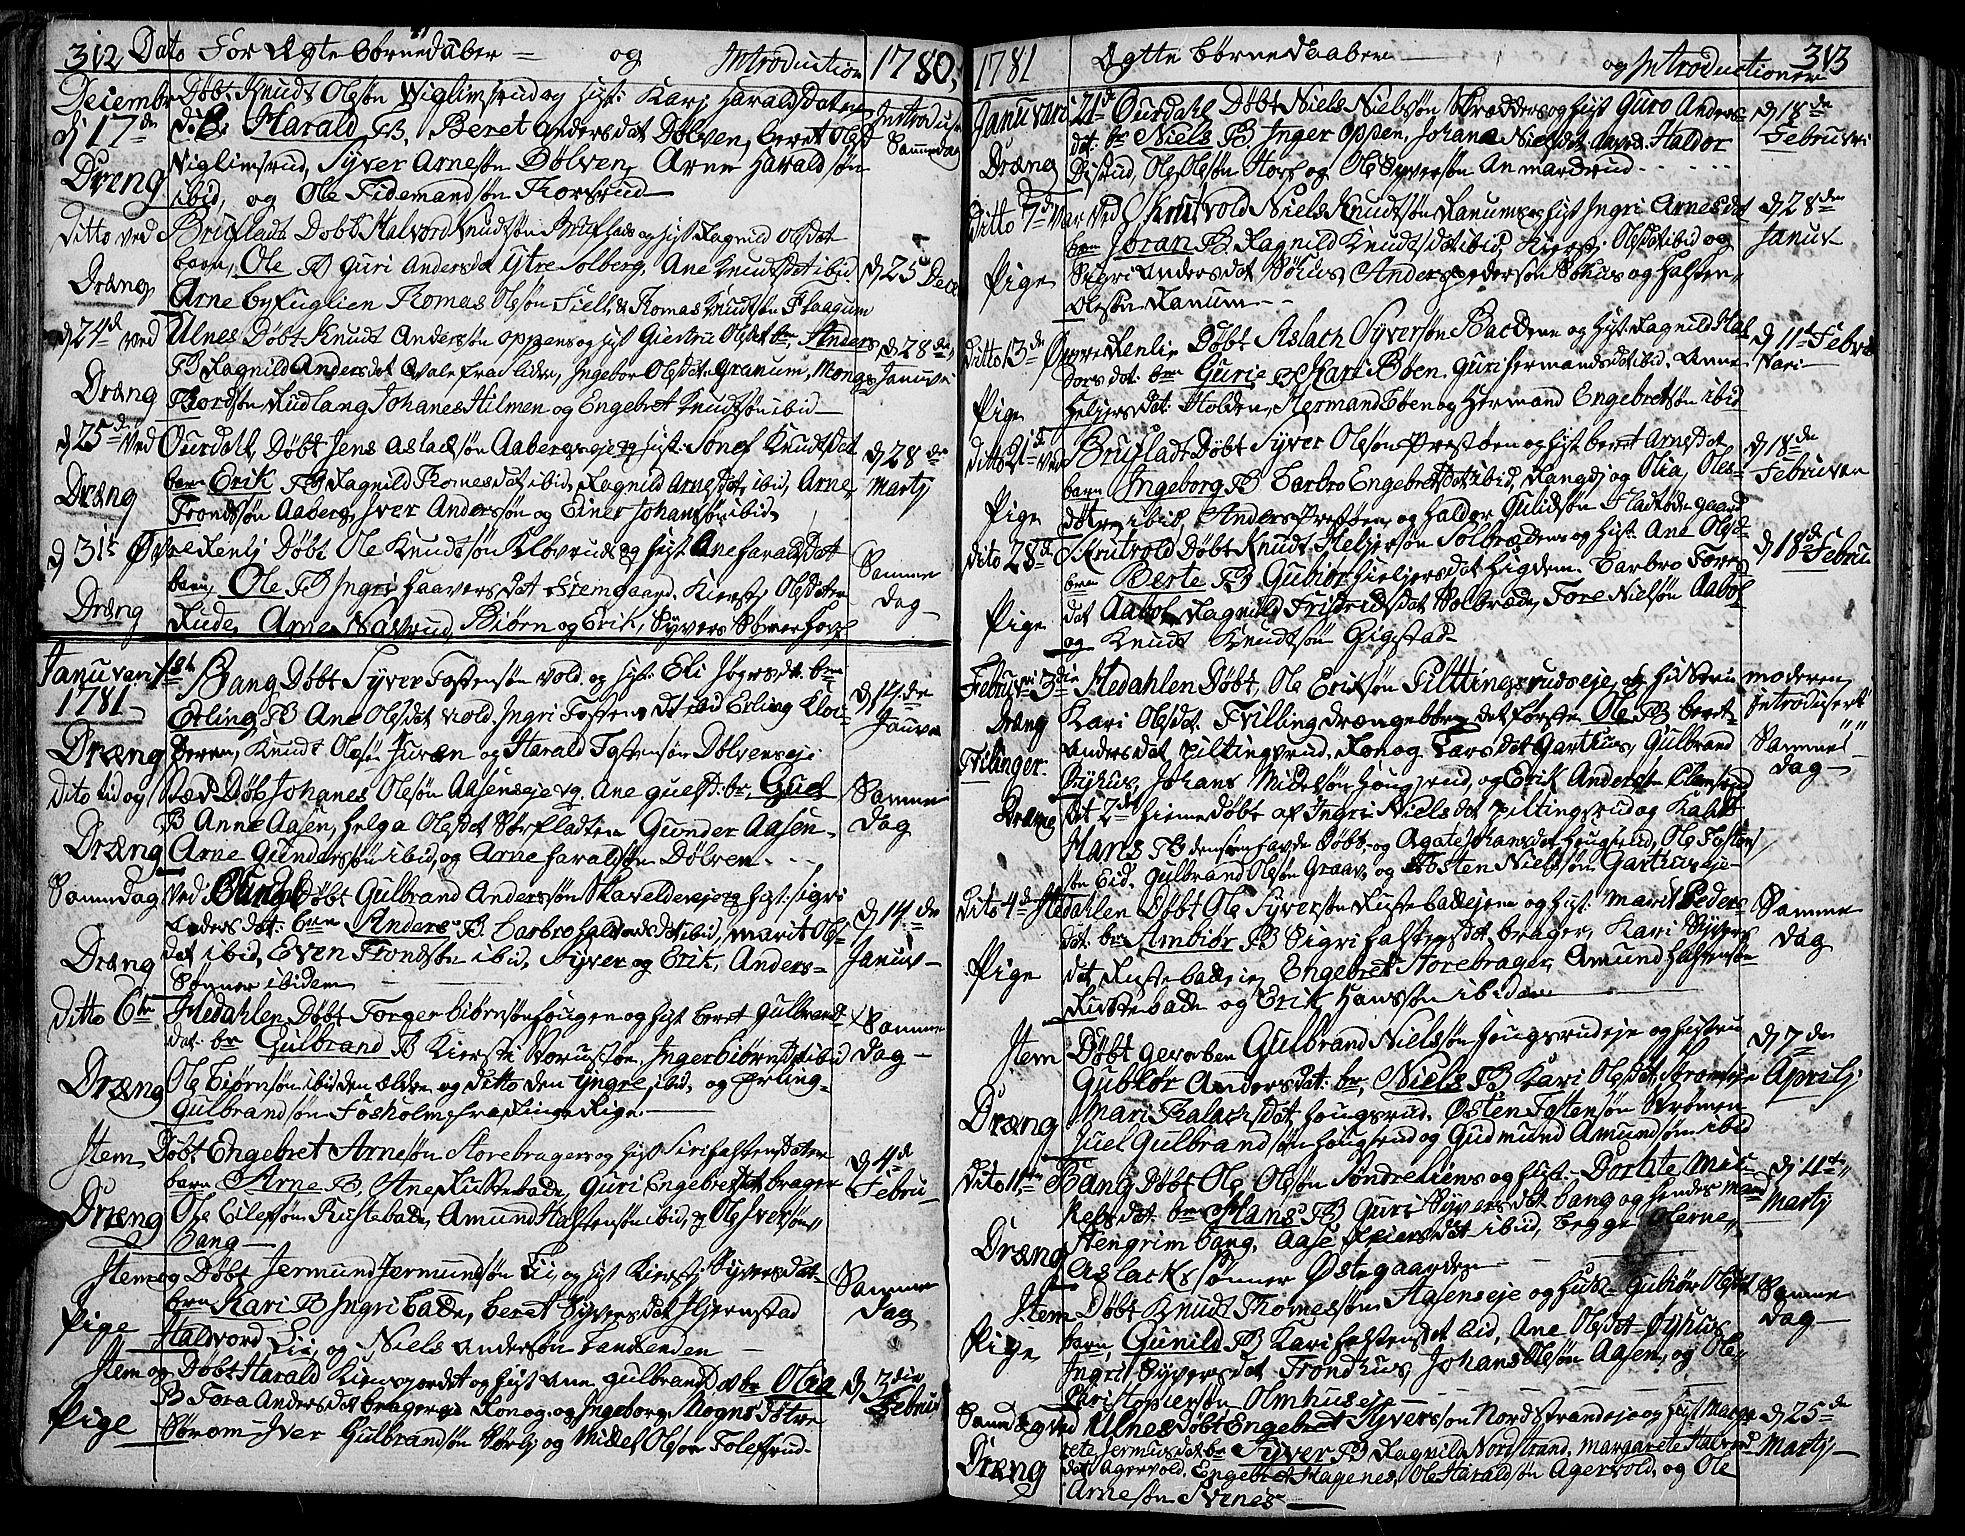 SAH, Aurdal prestekontor, Ministerialbok nr. 5, 1763-1781, s. 312-313